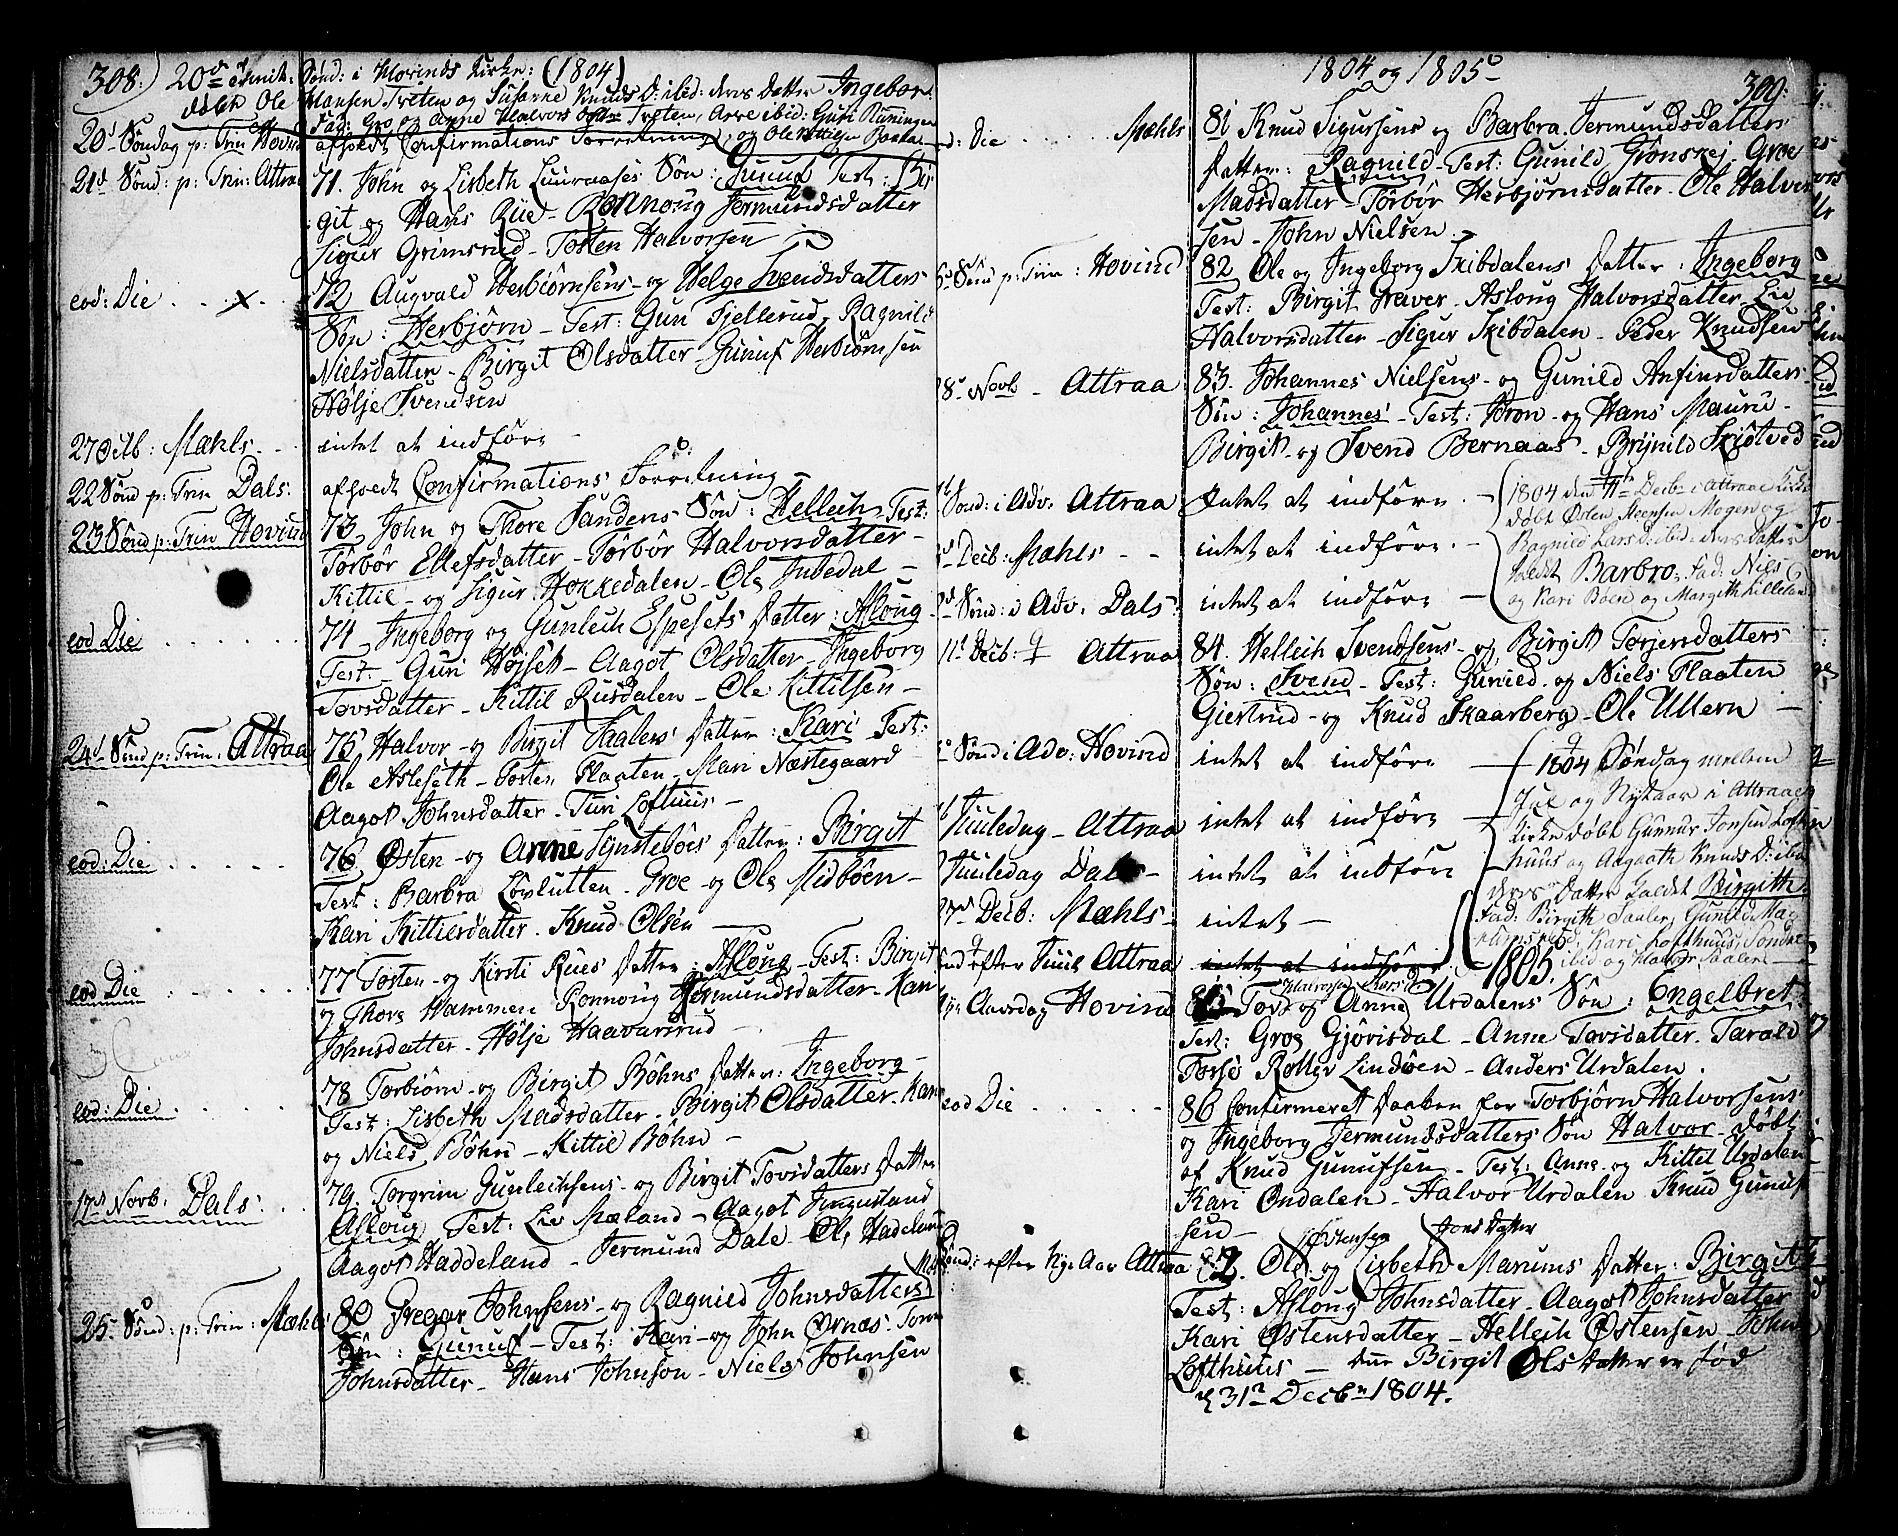 SAKO, Tinn kirkebøker, F/Fa/L0002: Ministerialbok nr. I 2, 1757-1810, s. 308-309